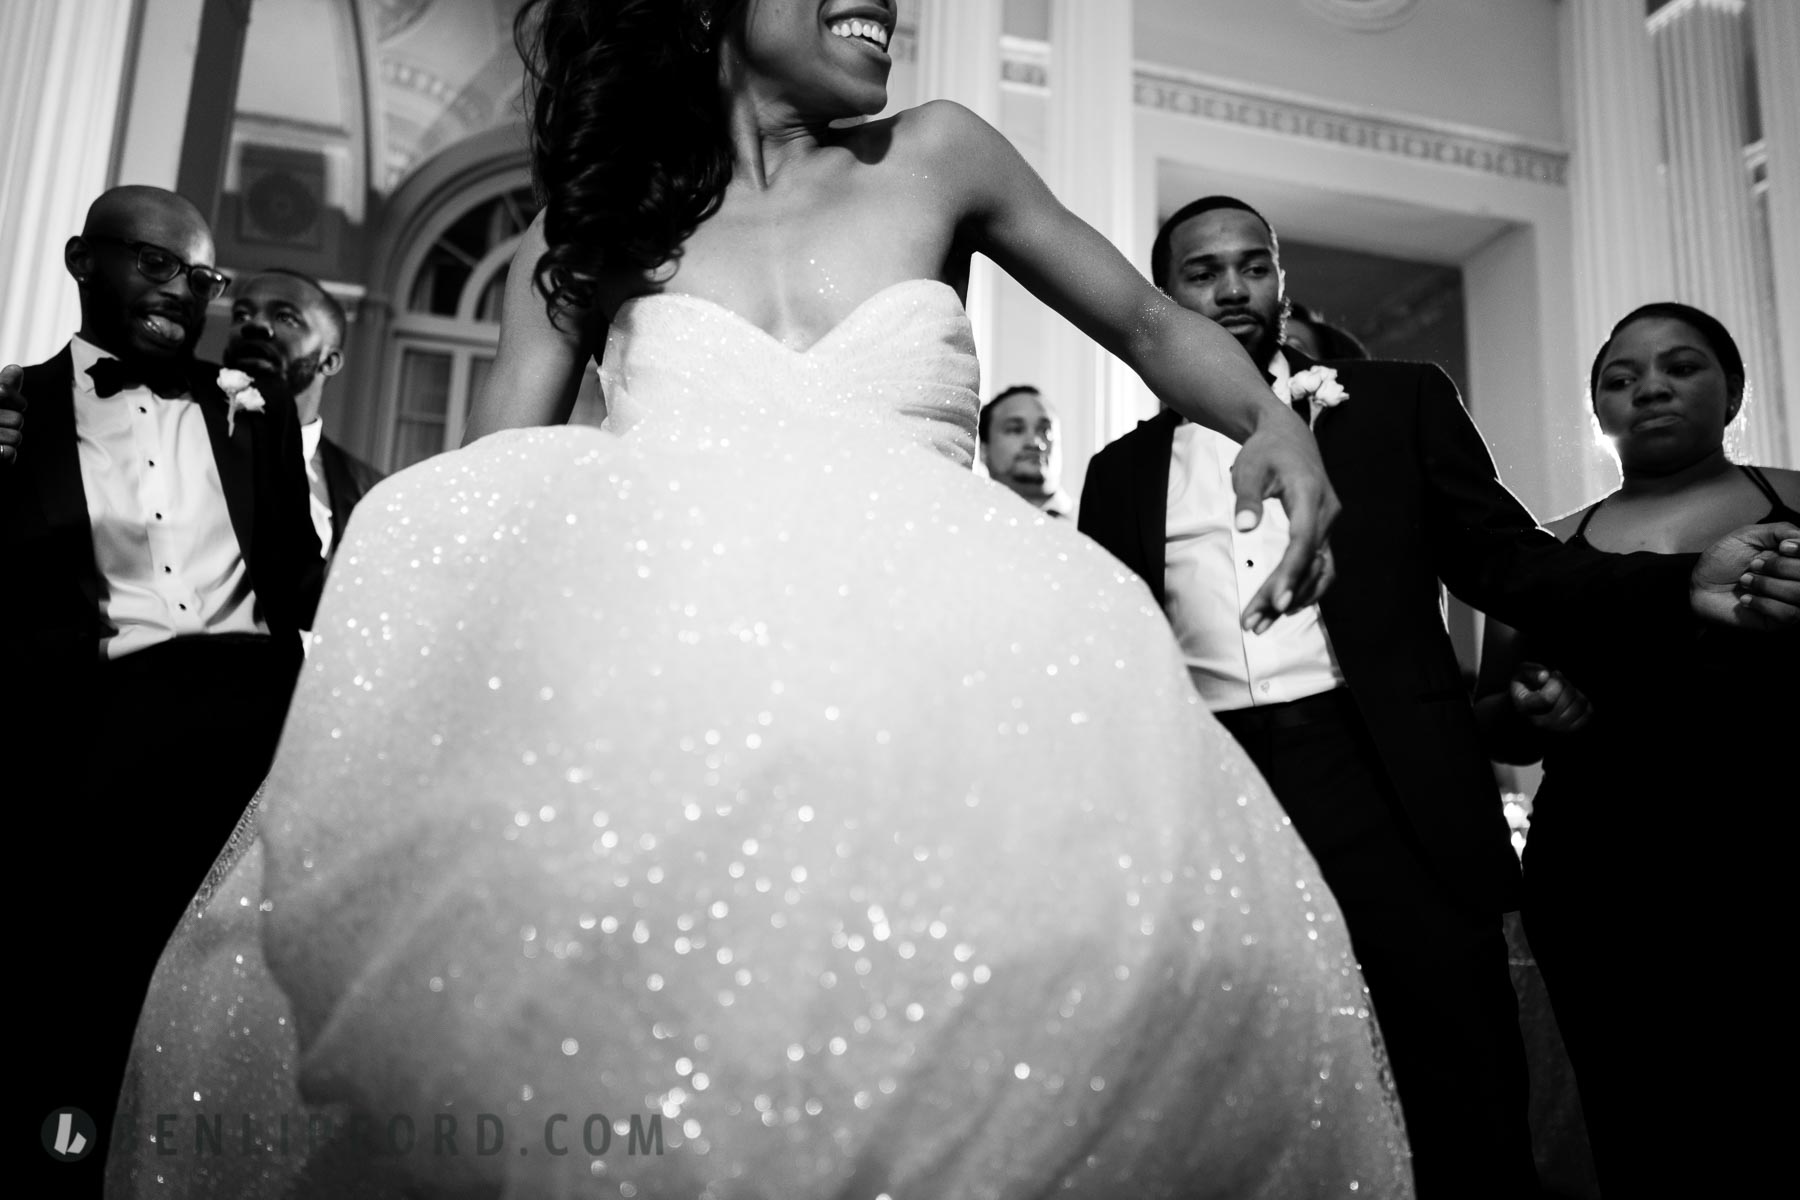 Cameron Jordan Wedding (22 of 24).jpg